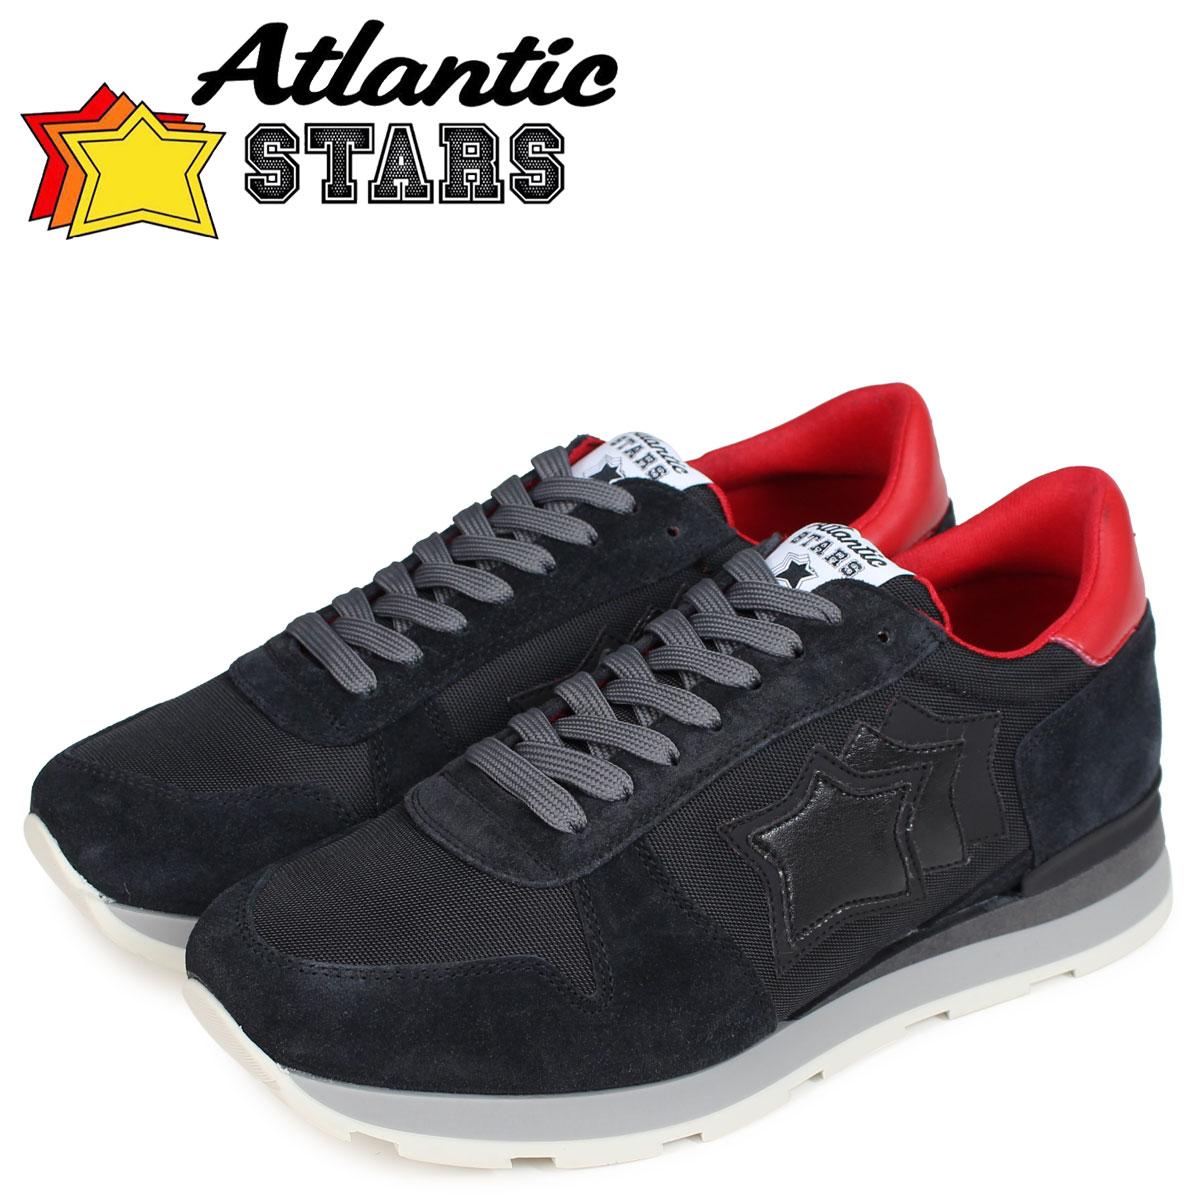 Atlantic STARS メンズ スニーカー アトランティックスターズ シリウス SIRIUS NOB-63N ブラック 黒